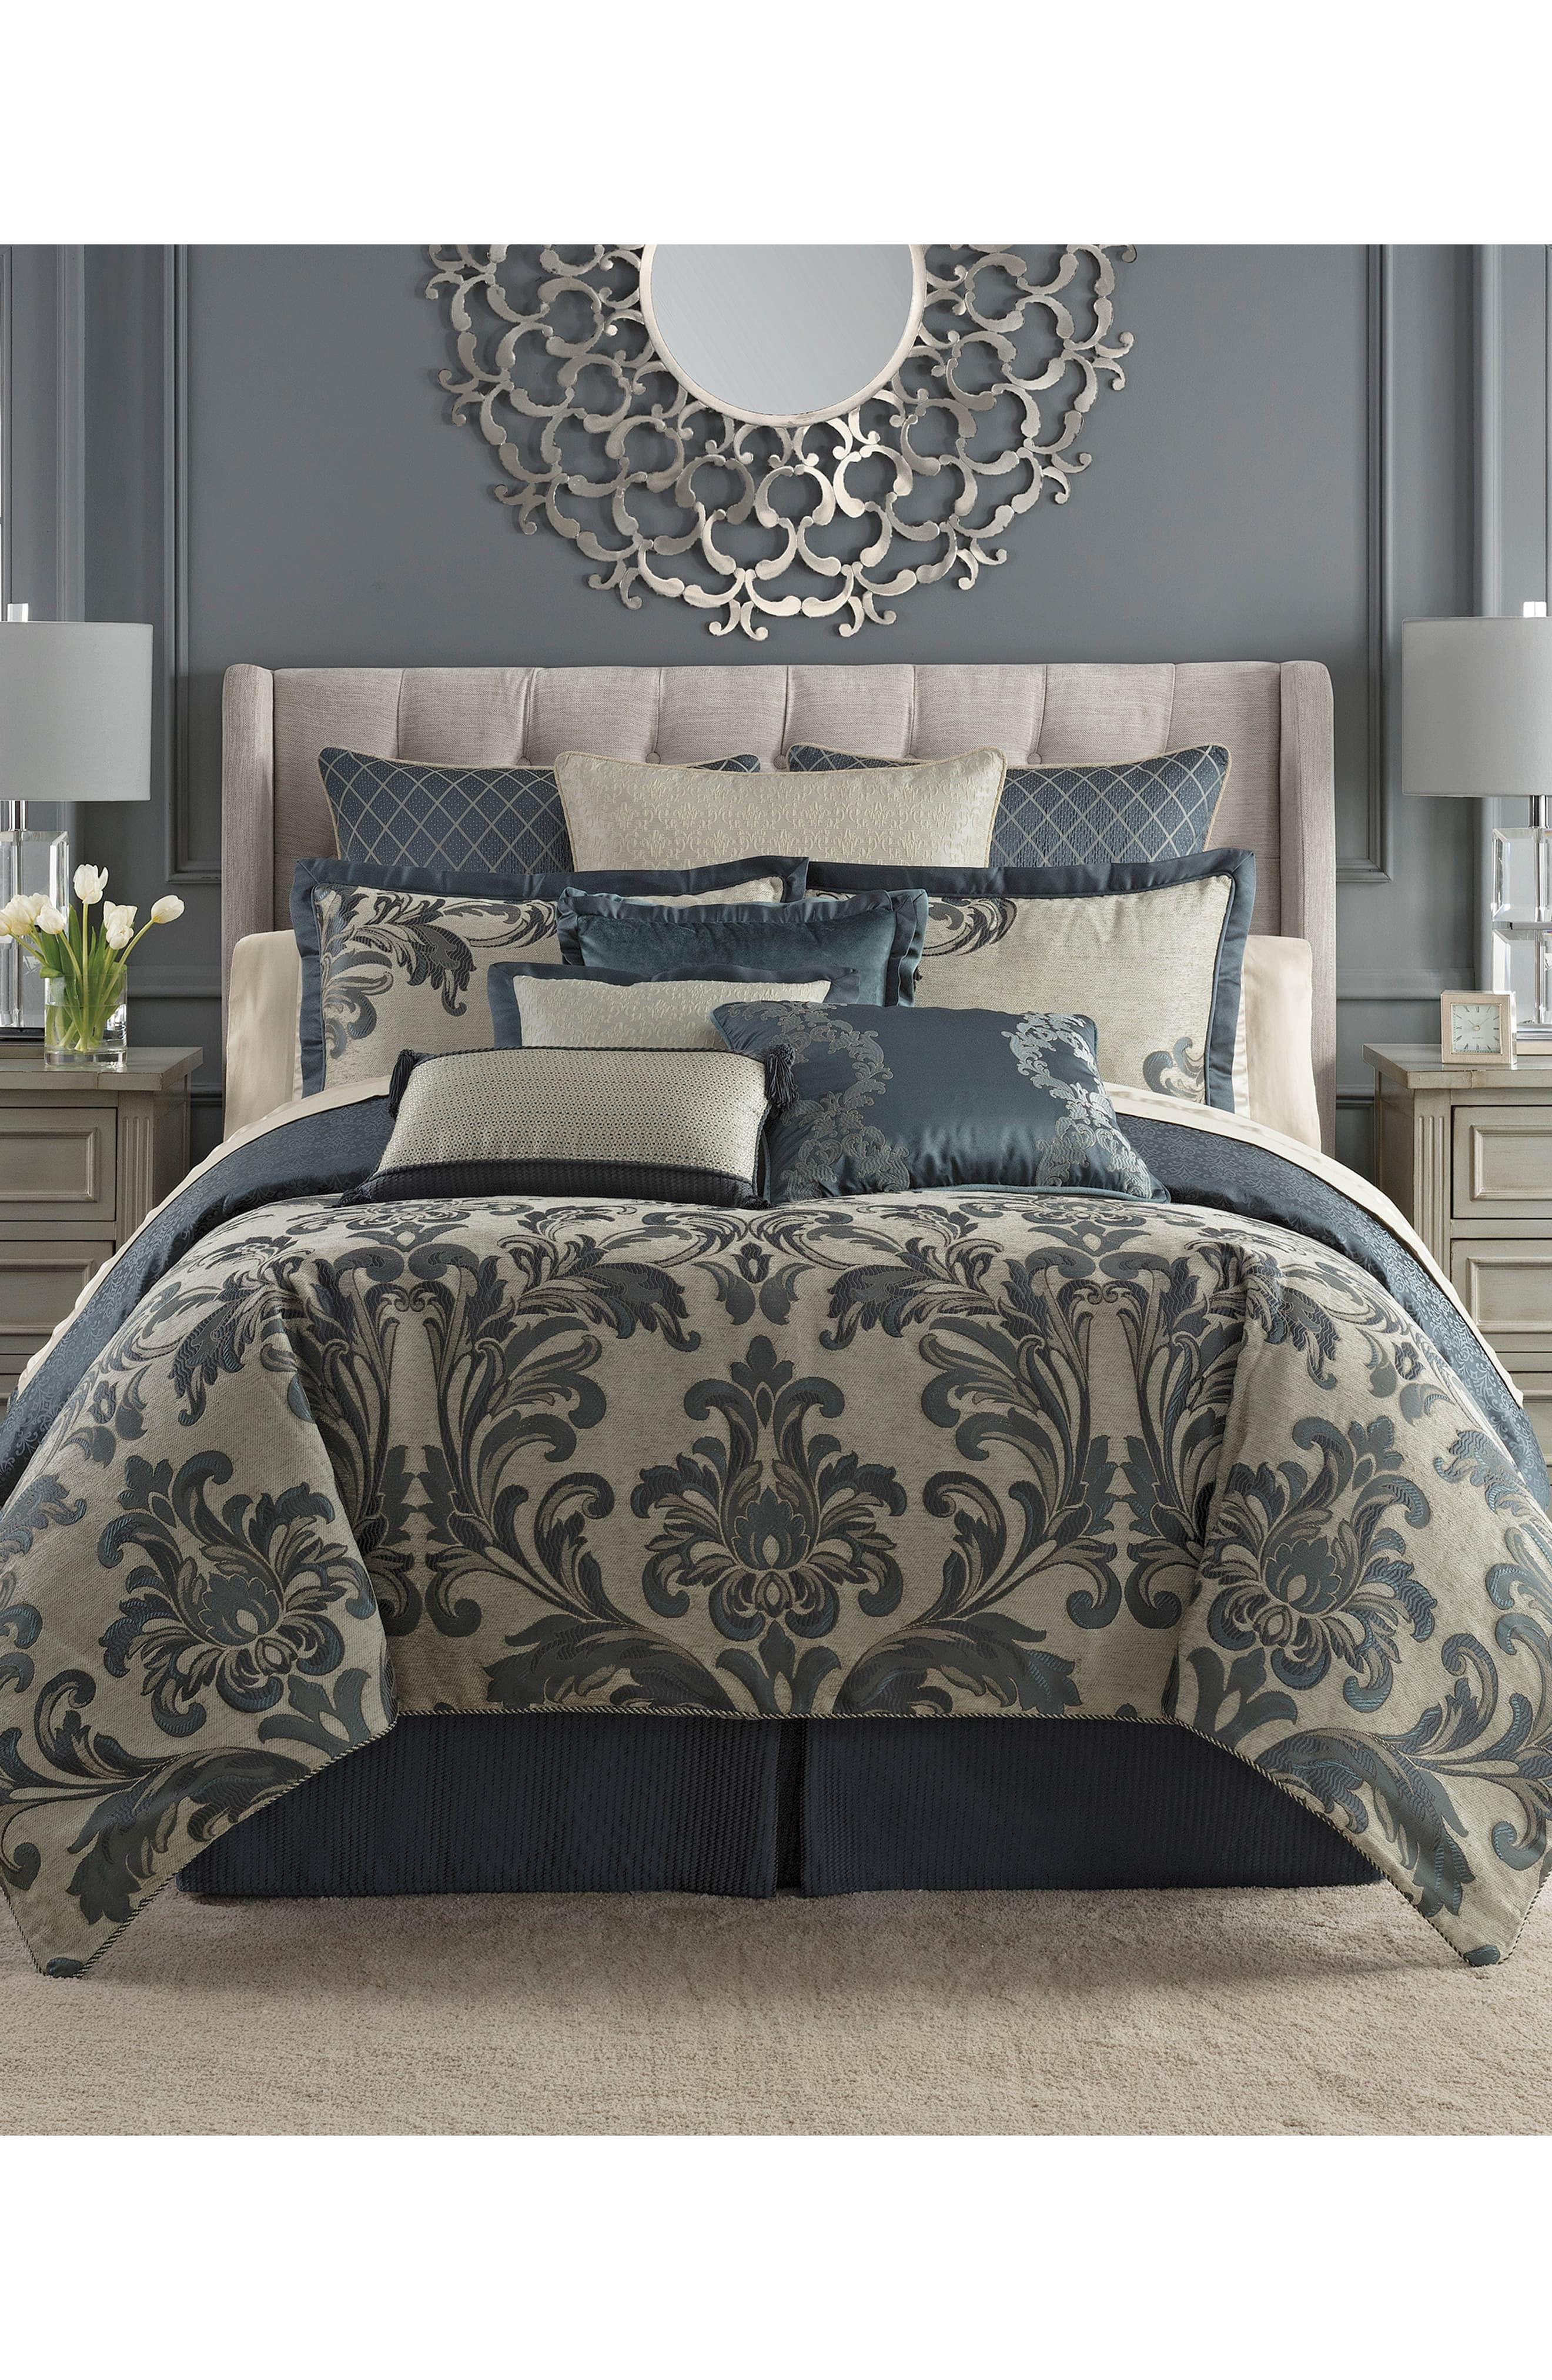 Waterford Everett Reversible Comforter Sham Bed Skirt Set Size Queen Blue In 2020 Bed Linens Luxury Teal Bedding Sets Bed Linen Sets